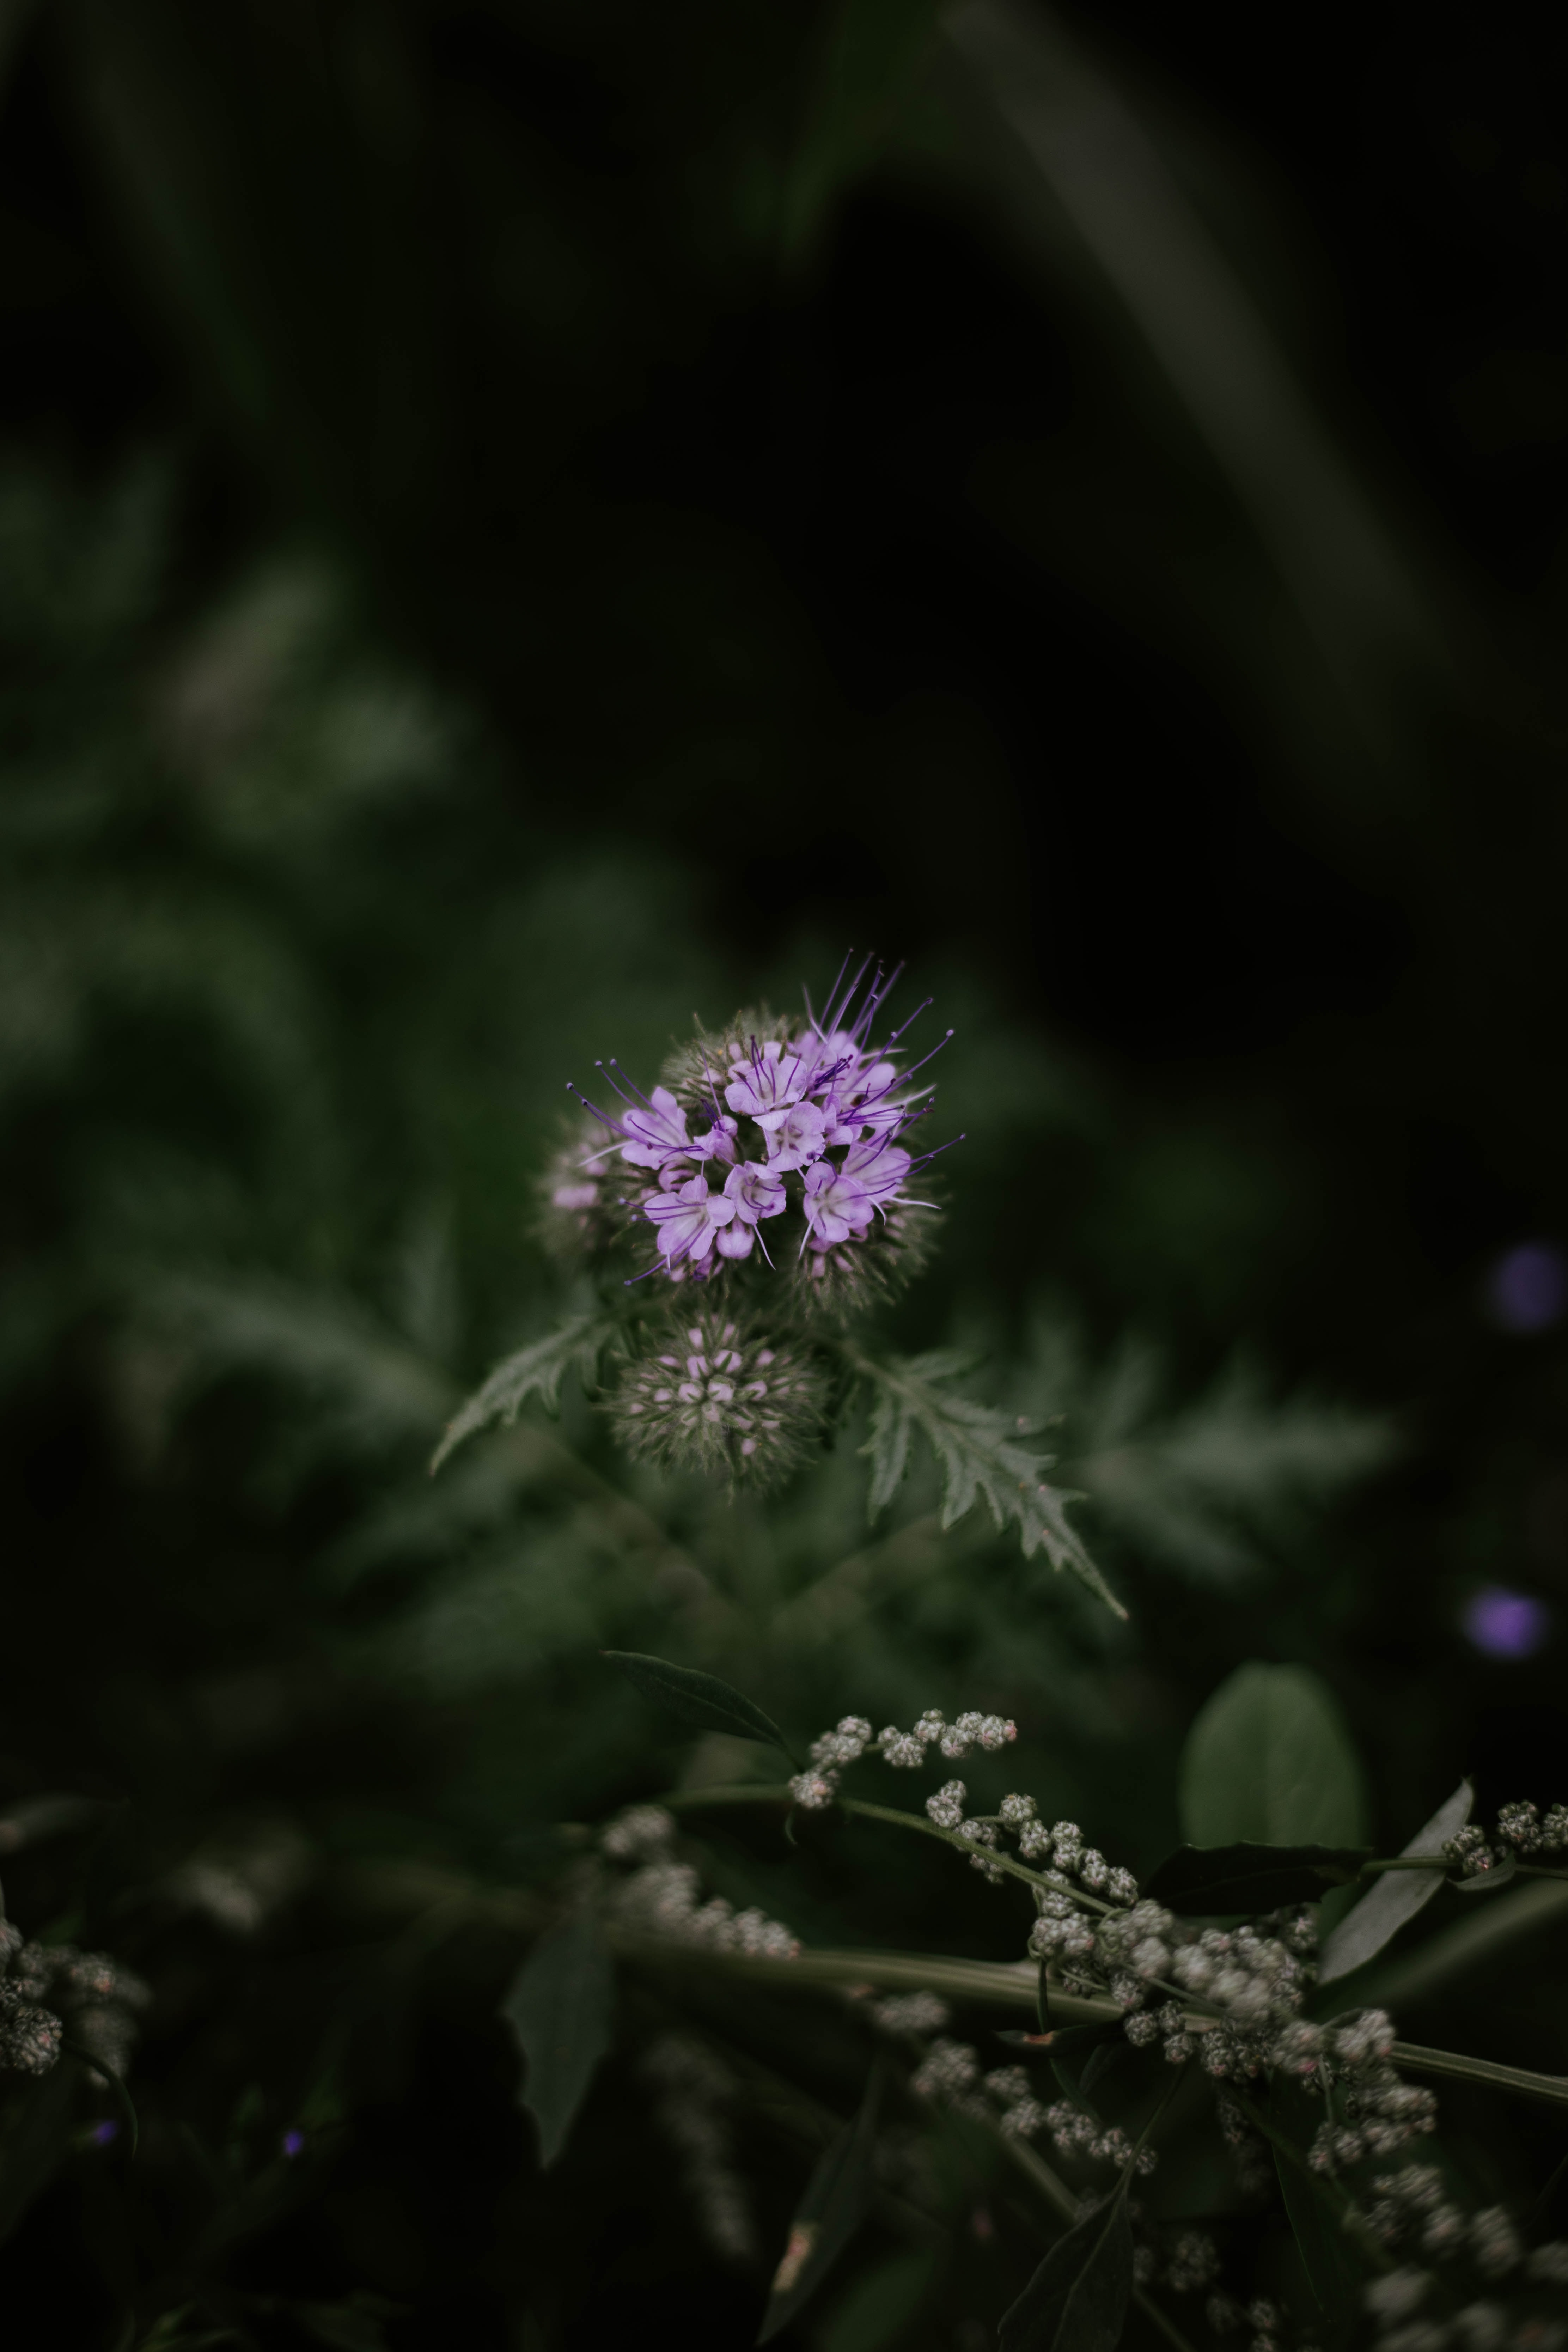 purple petaled flower in bloom